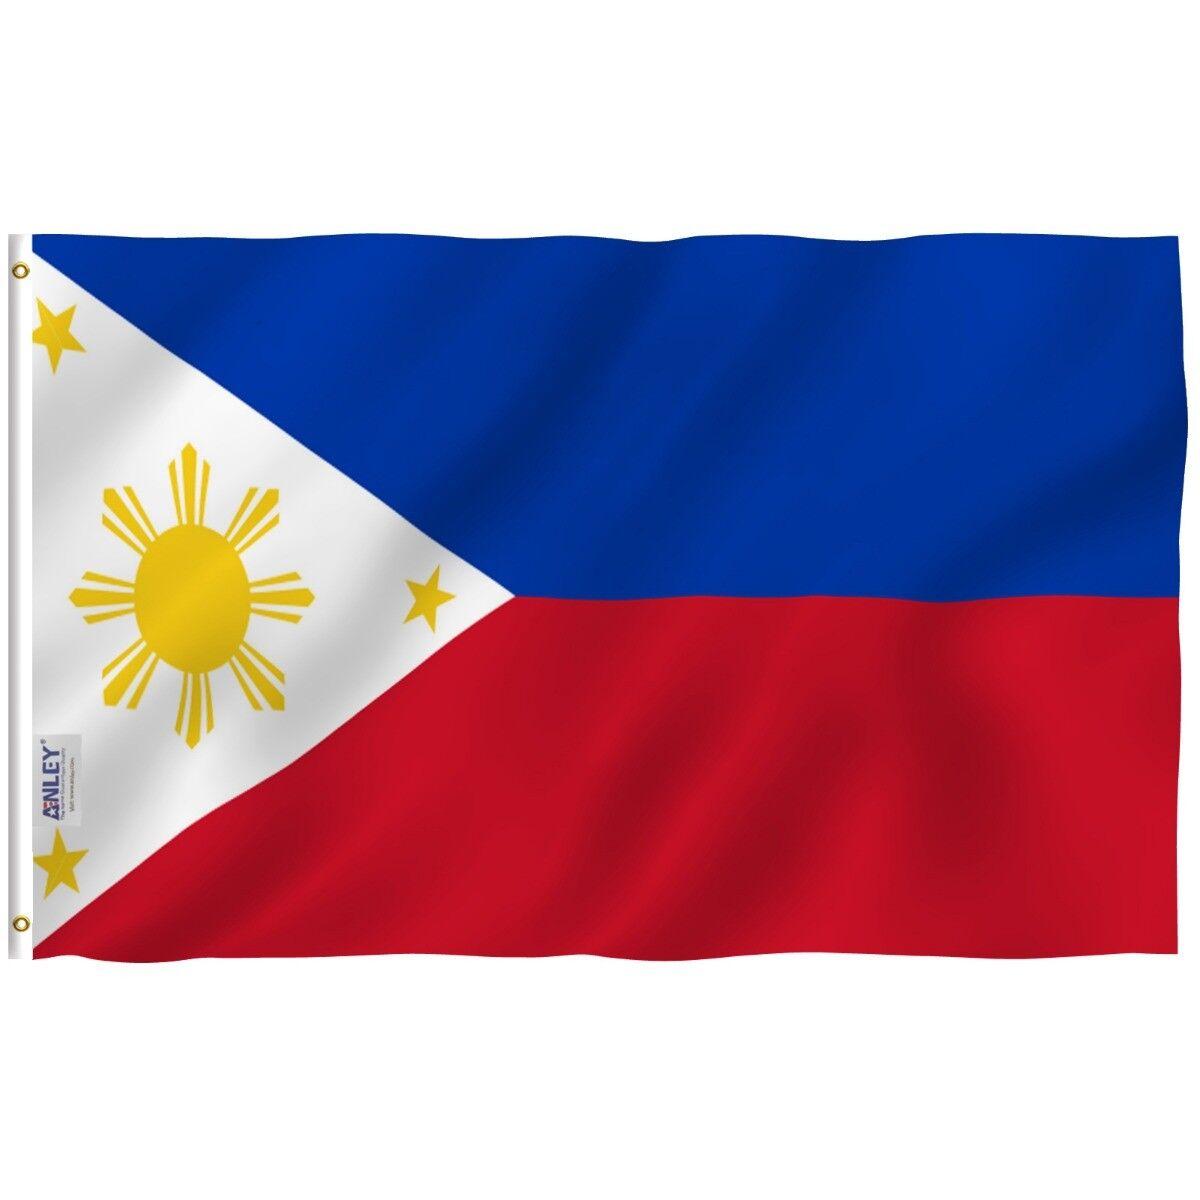 Anley Fly Breeze 3x5 Foot Philippines Flag Filipino Philippi